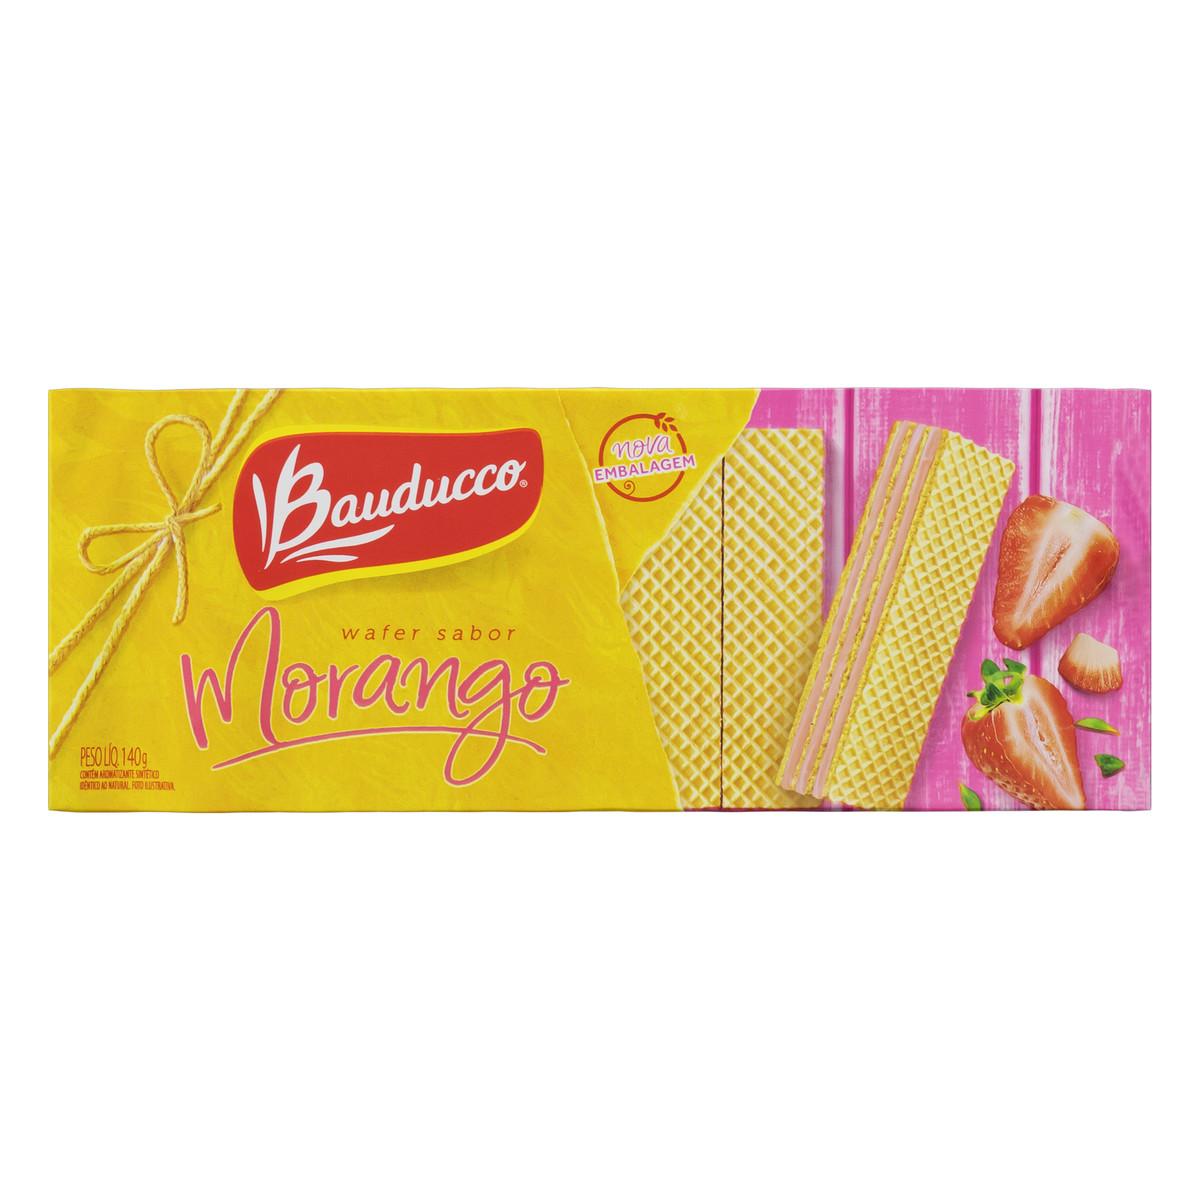 Biscoito Wafer Recheado De Morango Bauducco Pacote 140g